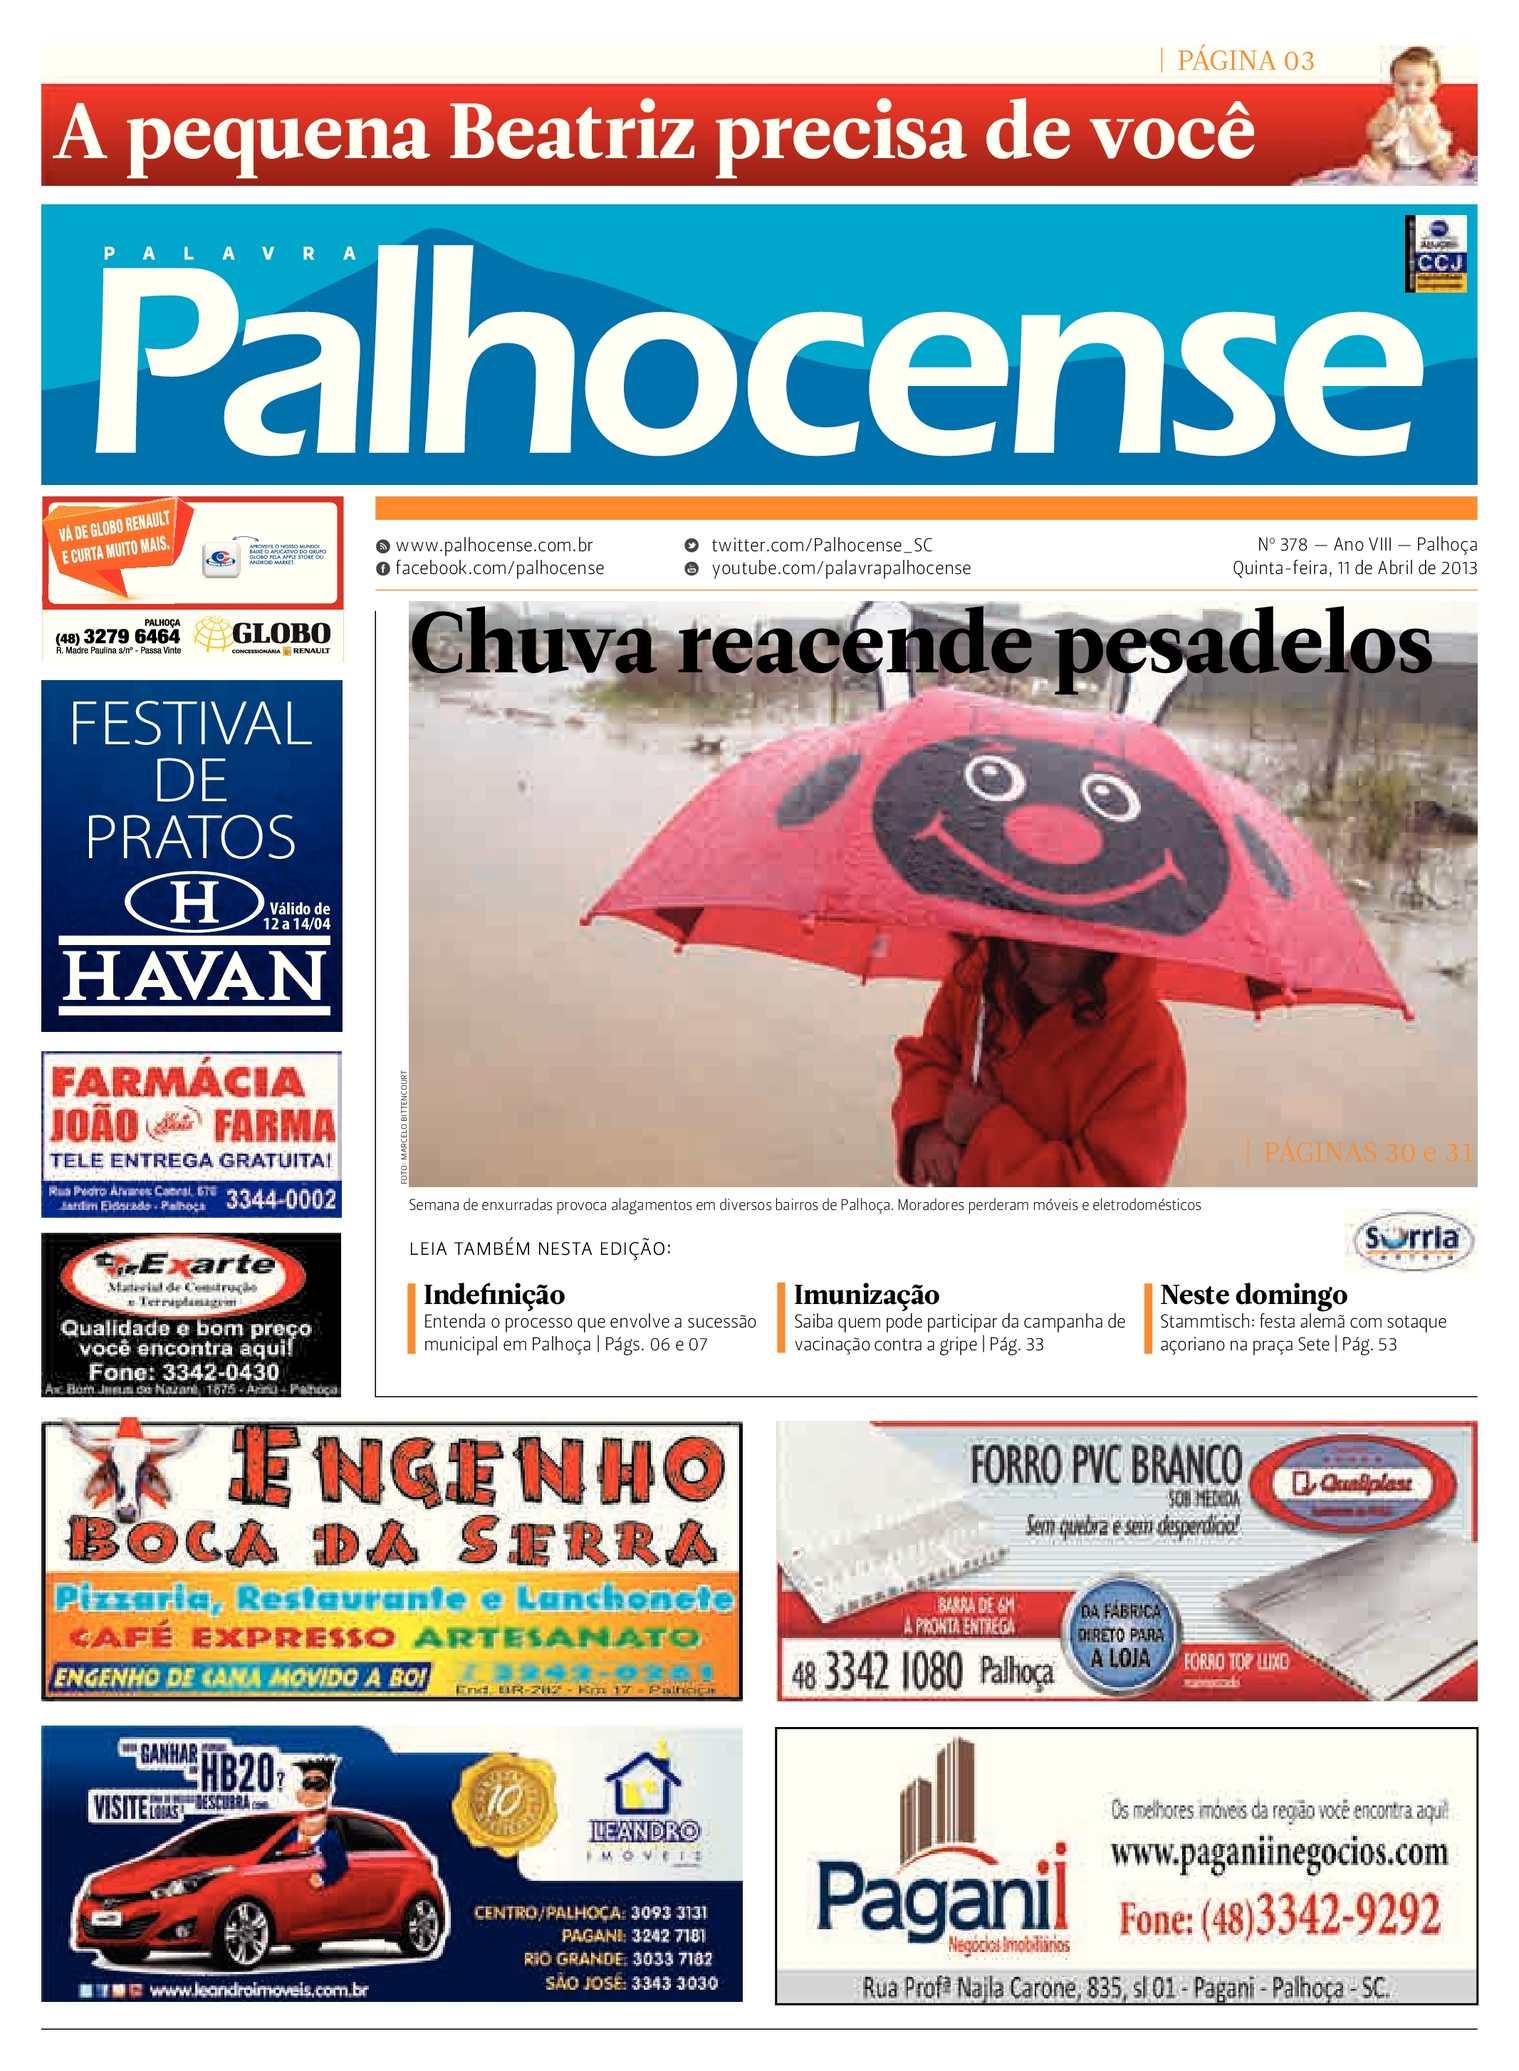 783eab9699be4 Calaméo - Jornal Palavra Palhocense - Edição 378